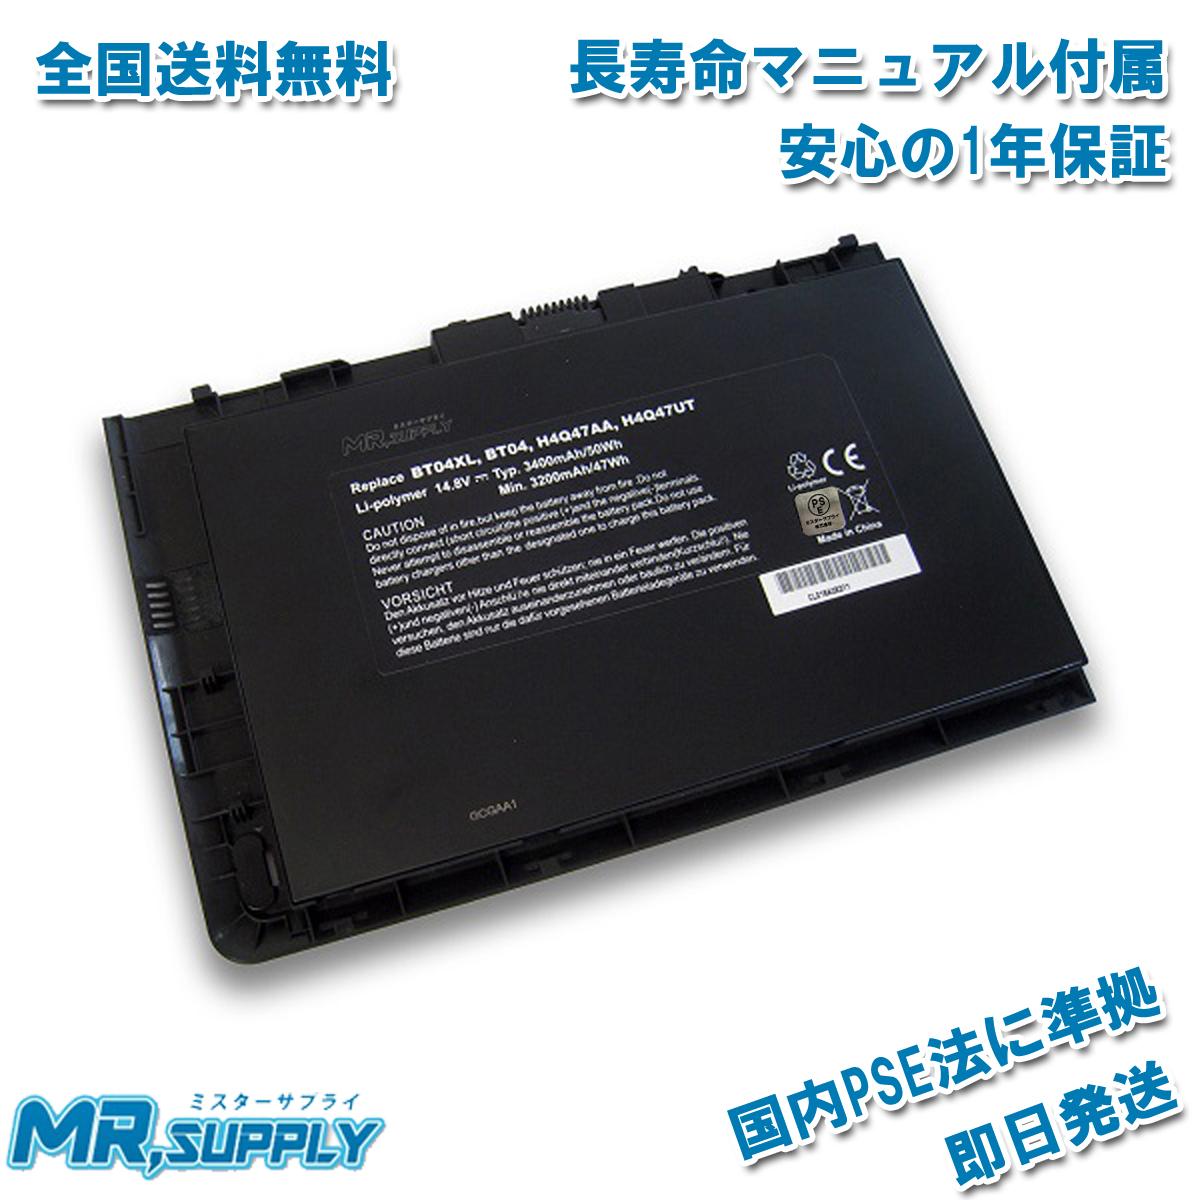 【全国送料無料】HP EliteBook Folio 9470m 交換用バッテリー BT04 BT04XL H4Q47AA H4Q47UT 対応